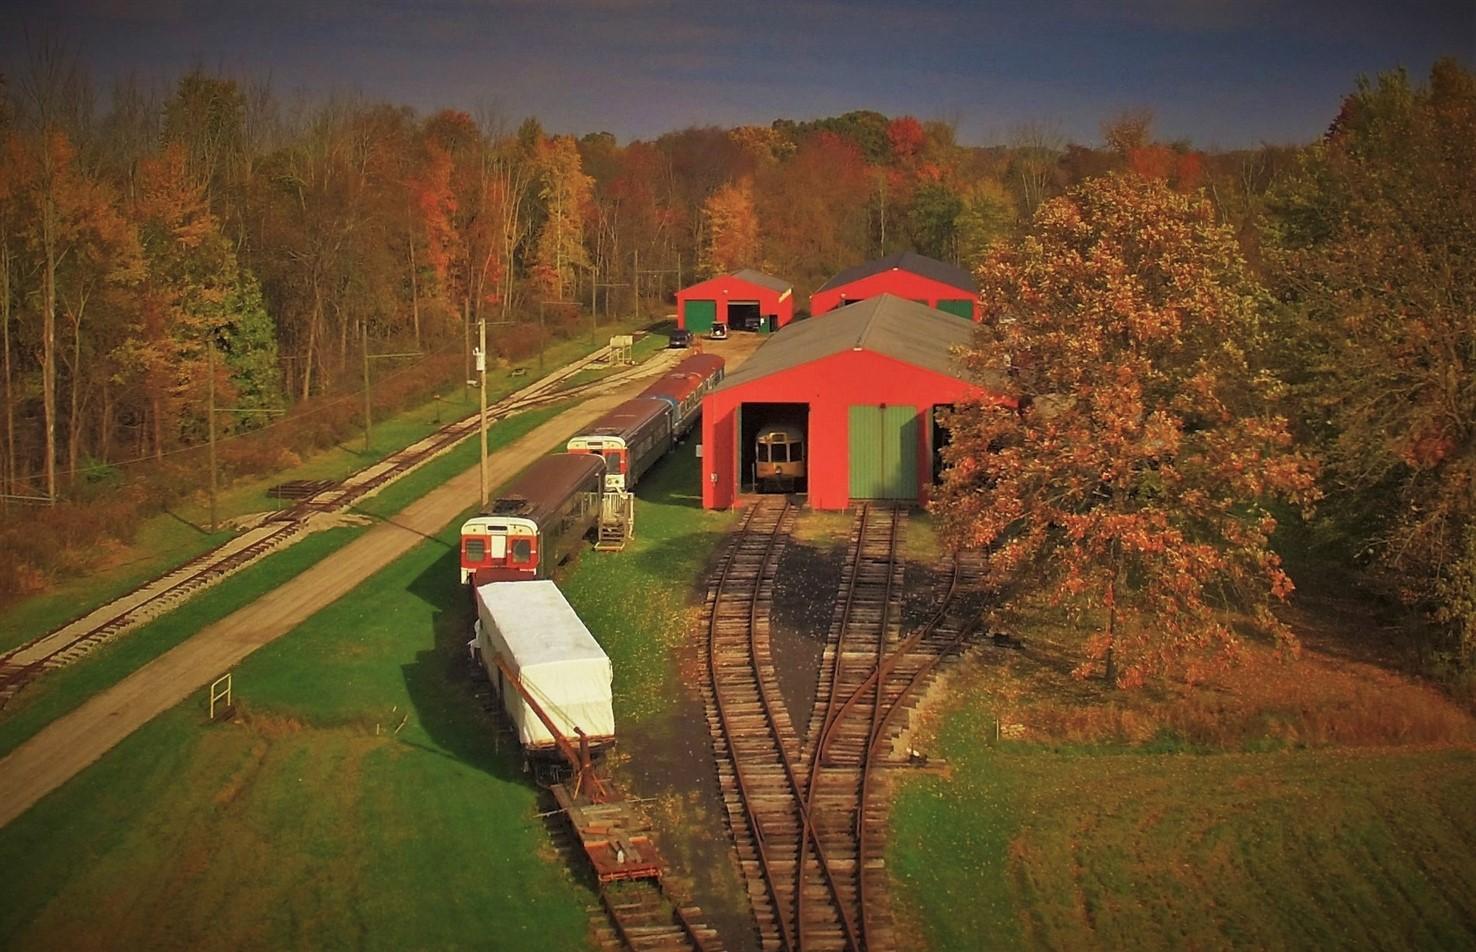 2016 10 29 46 Seville OH Northern Ohio Railway Museum.jpg